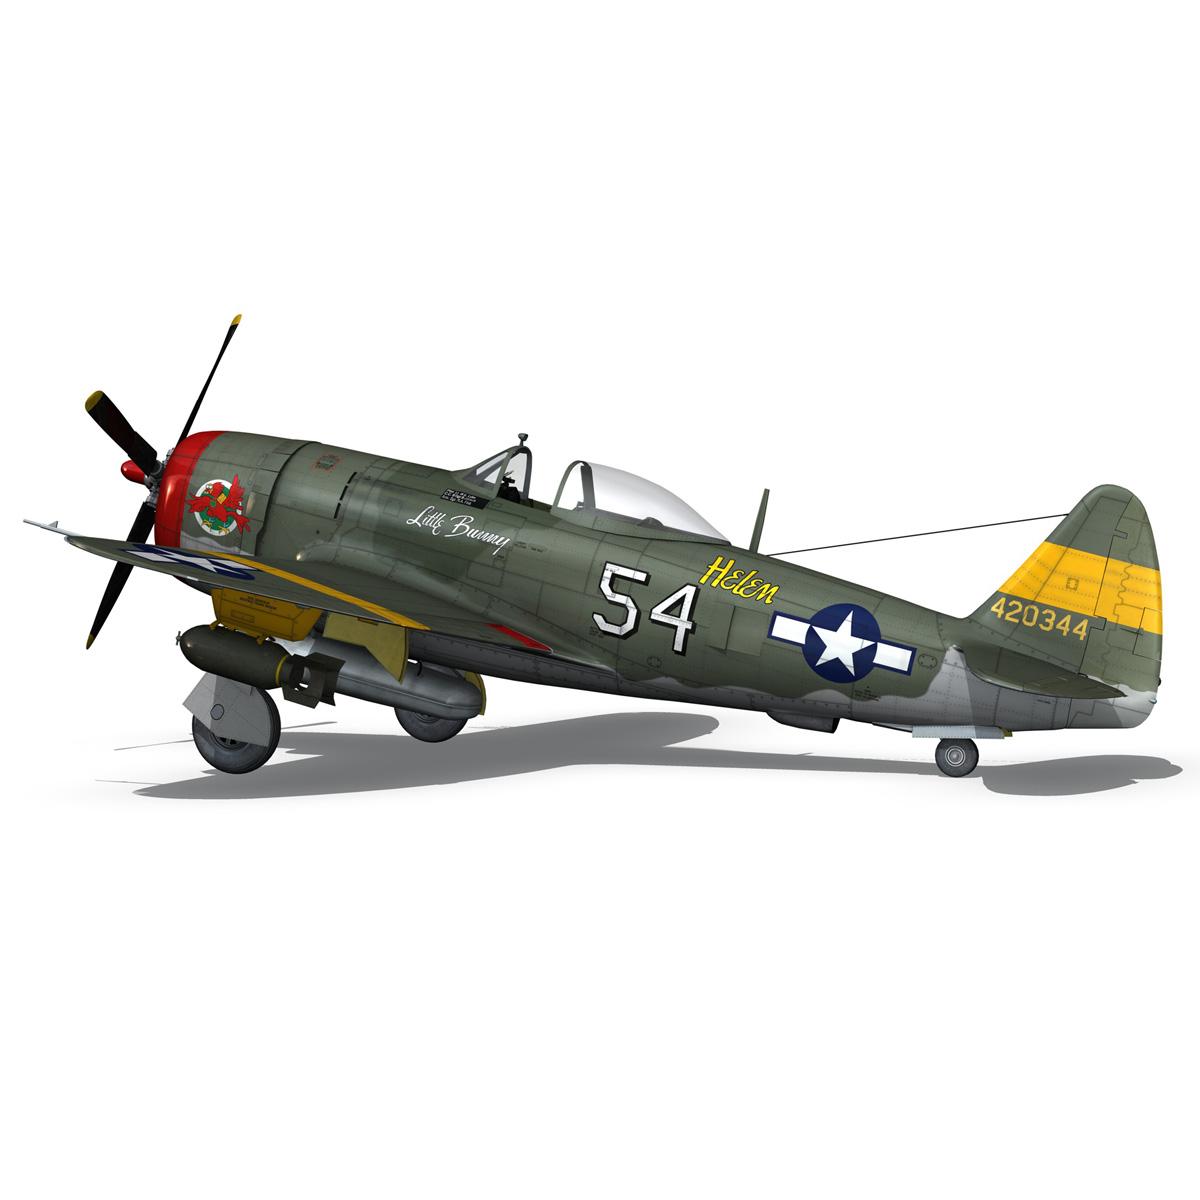 republic p-47d thunderbolt – little bunny 3d model fbx c4d lwo obj 274229